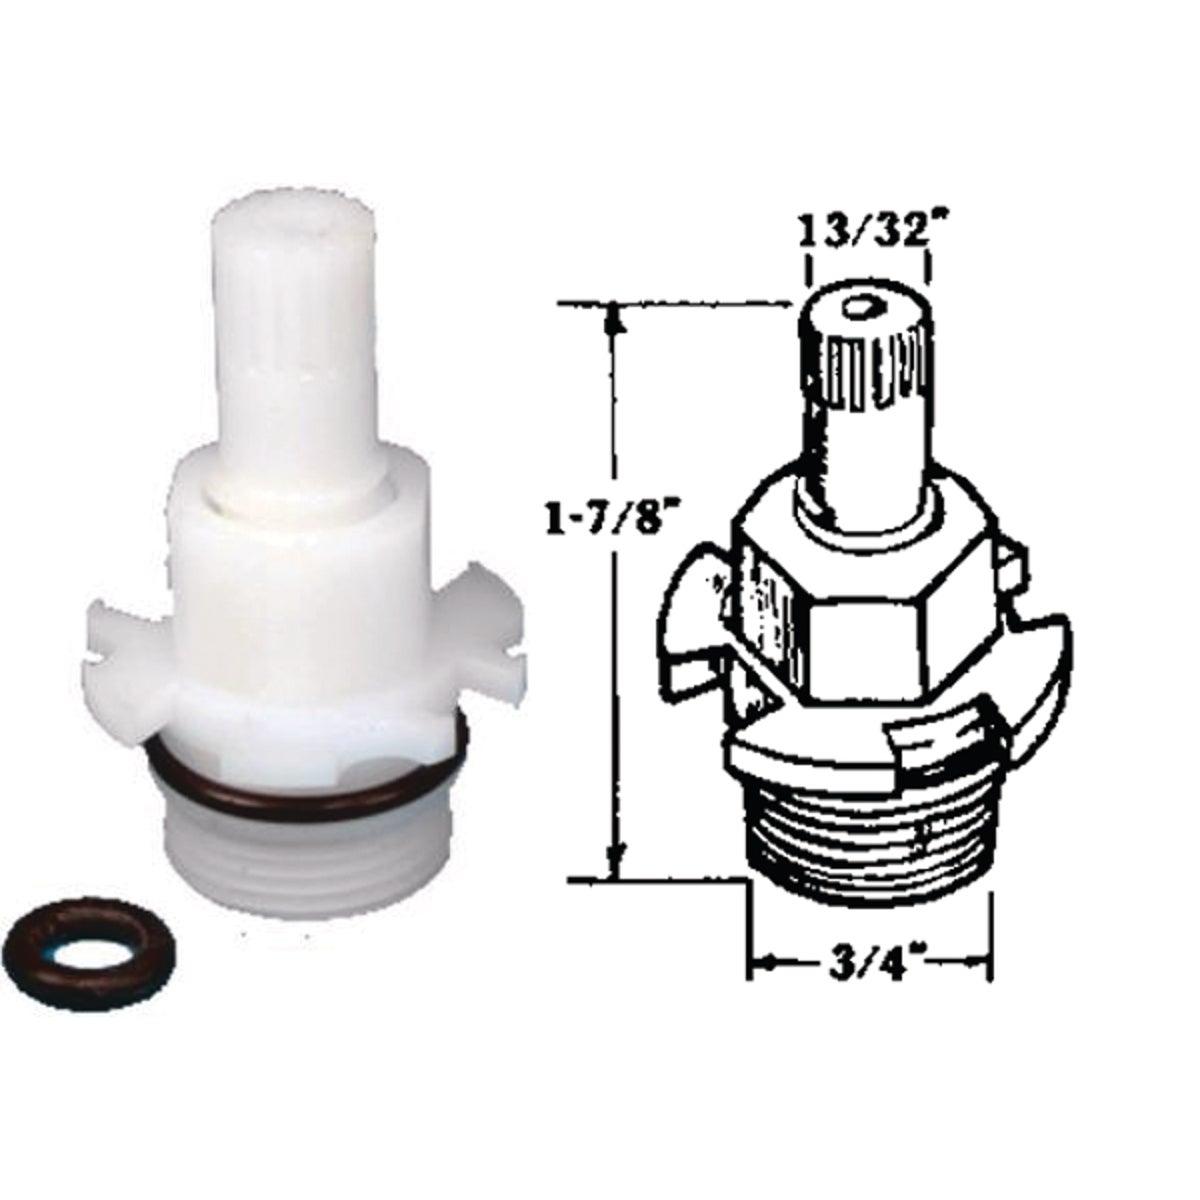 UTOPIA FAUCET STEM - P-119C by U S Hardware